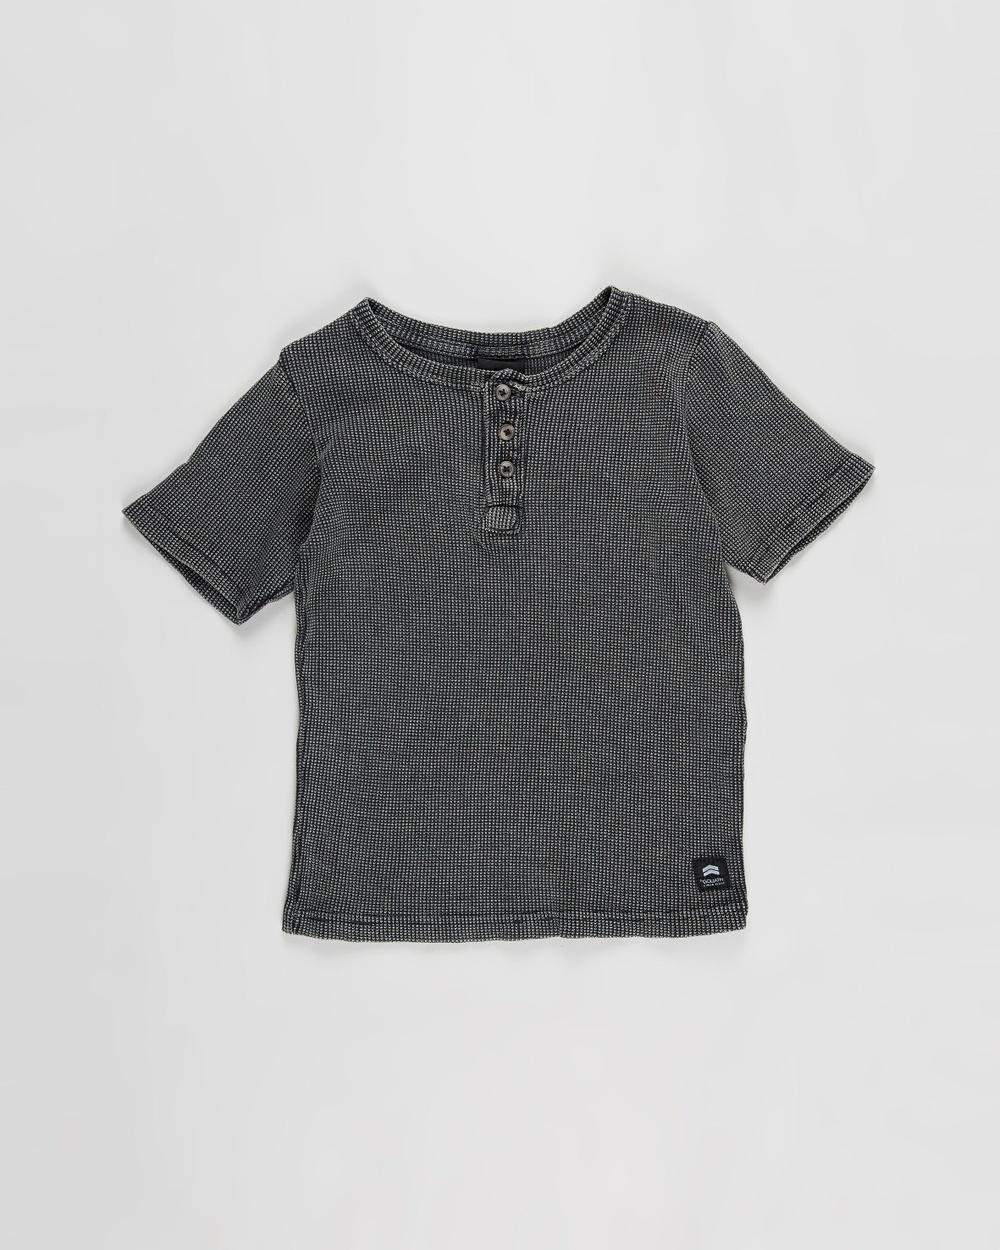 St Goliath - Acid Waffle Henley Tee   Kids - T-Shirts & Singlets (Black) Acid Waffle Henley Tee - Kids